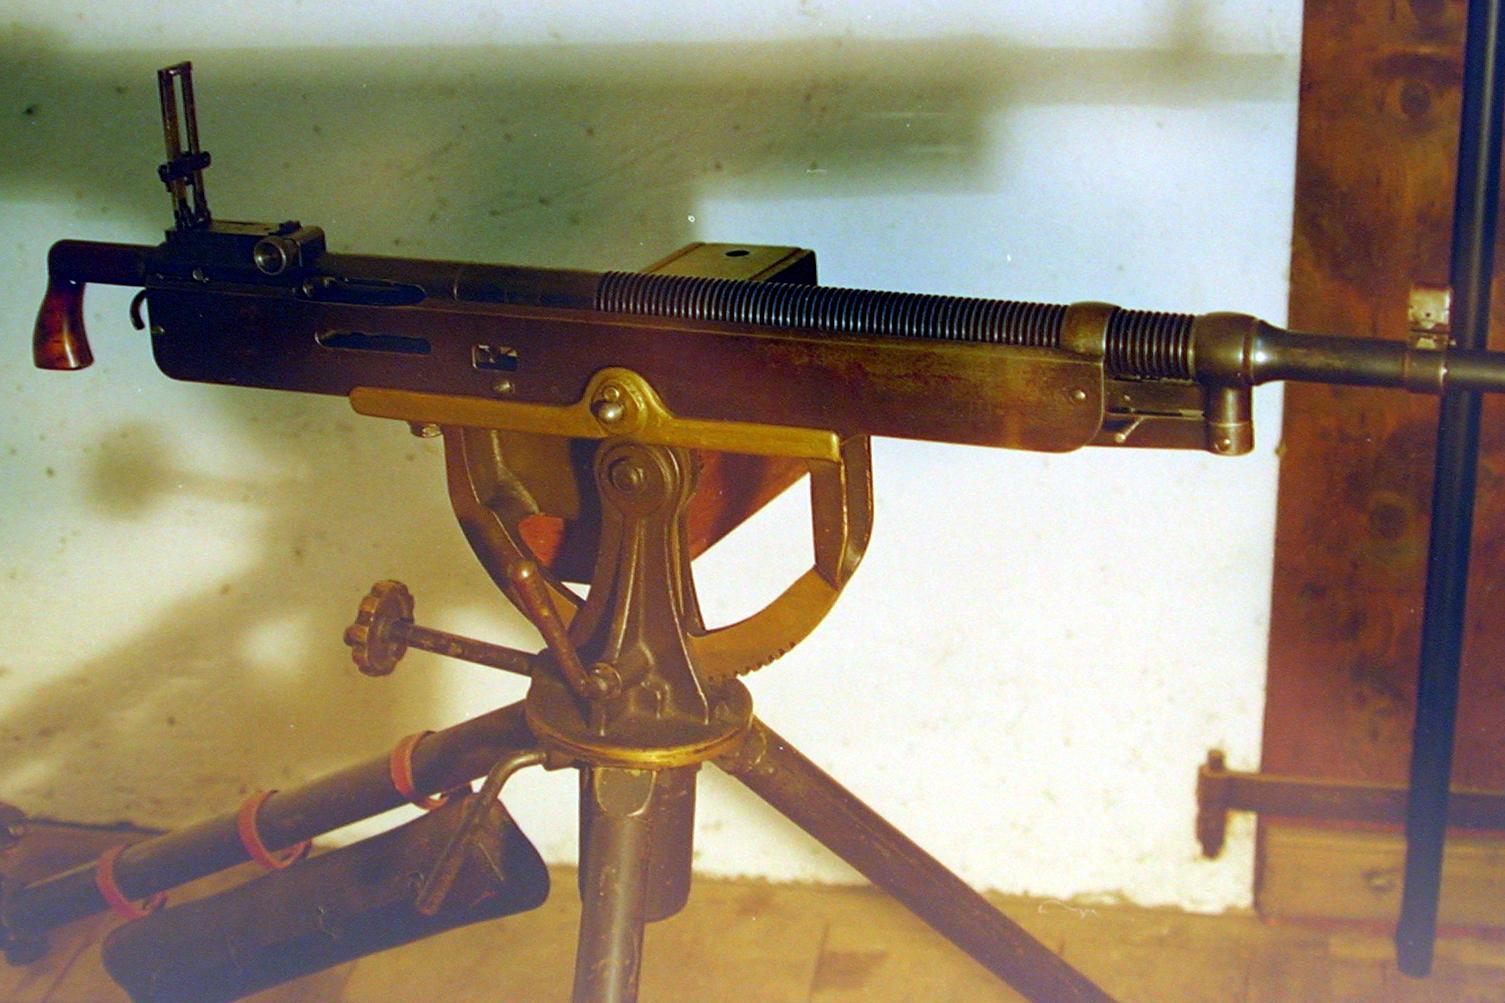 A historic WW1-era machine gun was stolen from its public display case in northern Indiana.